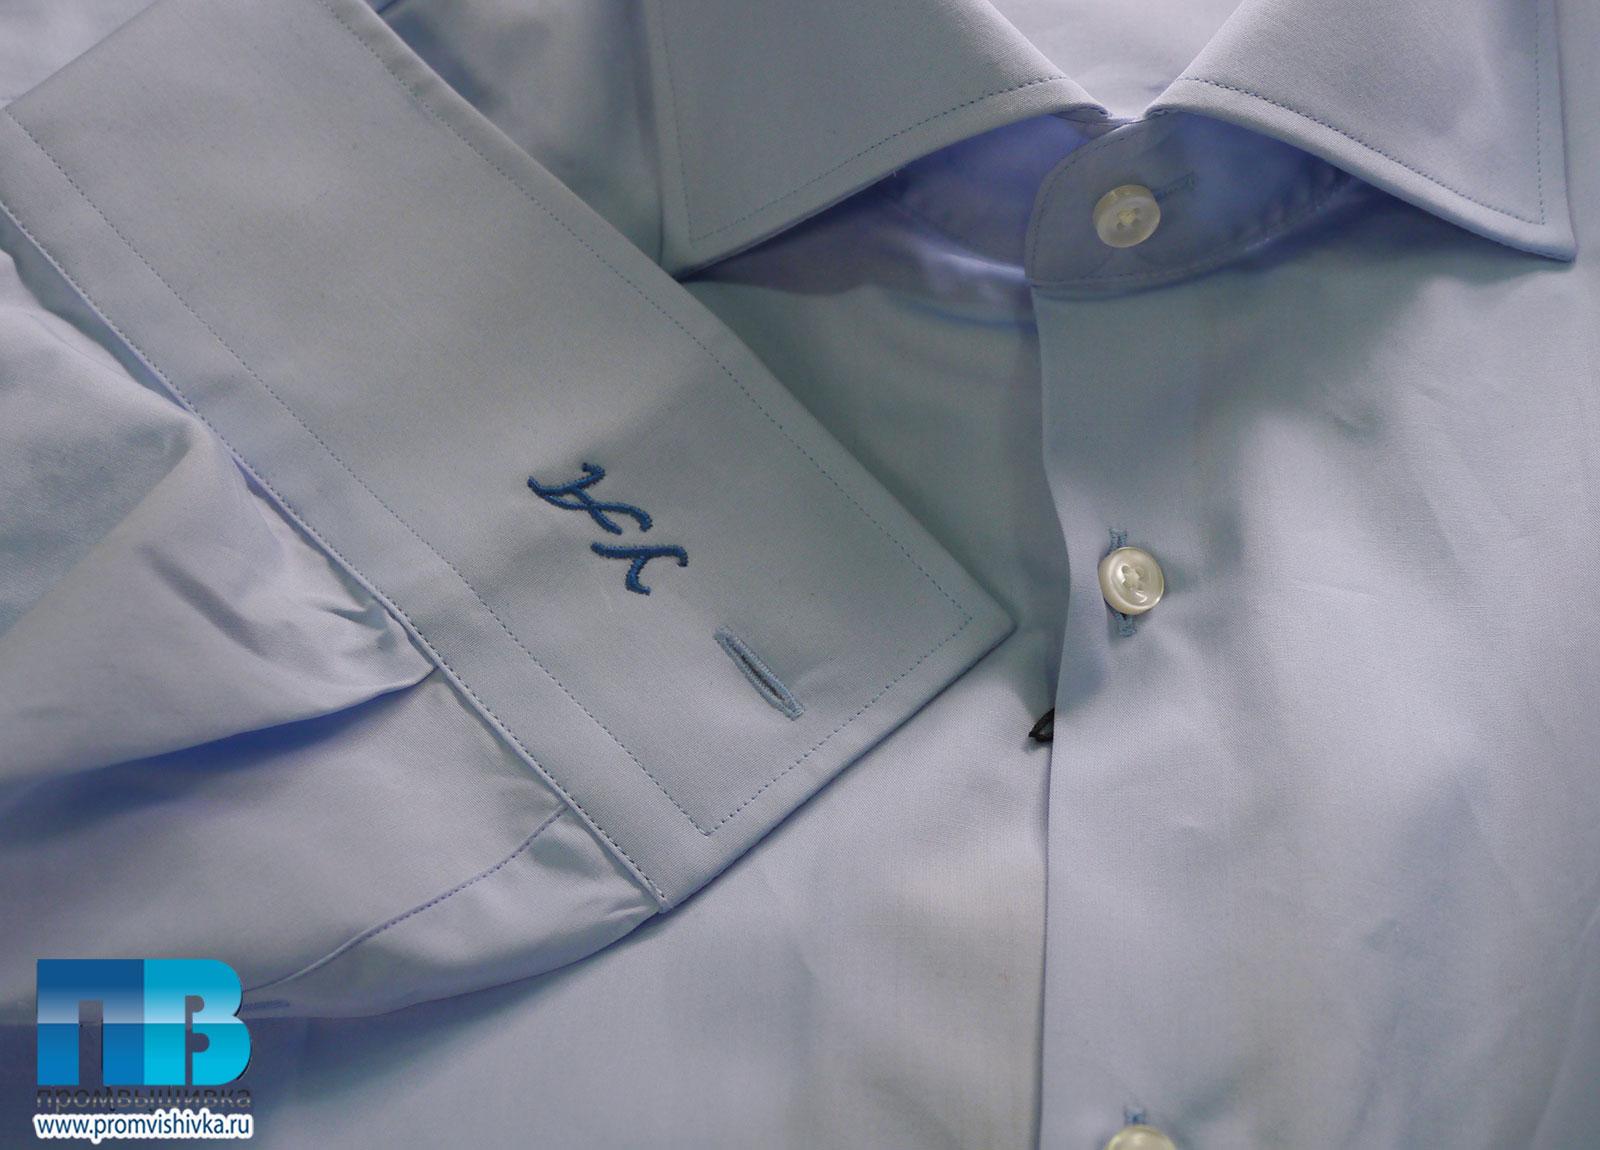 Рубашки на заказ с вышивкой